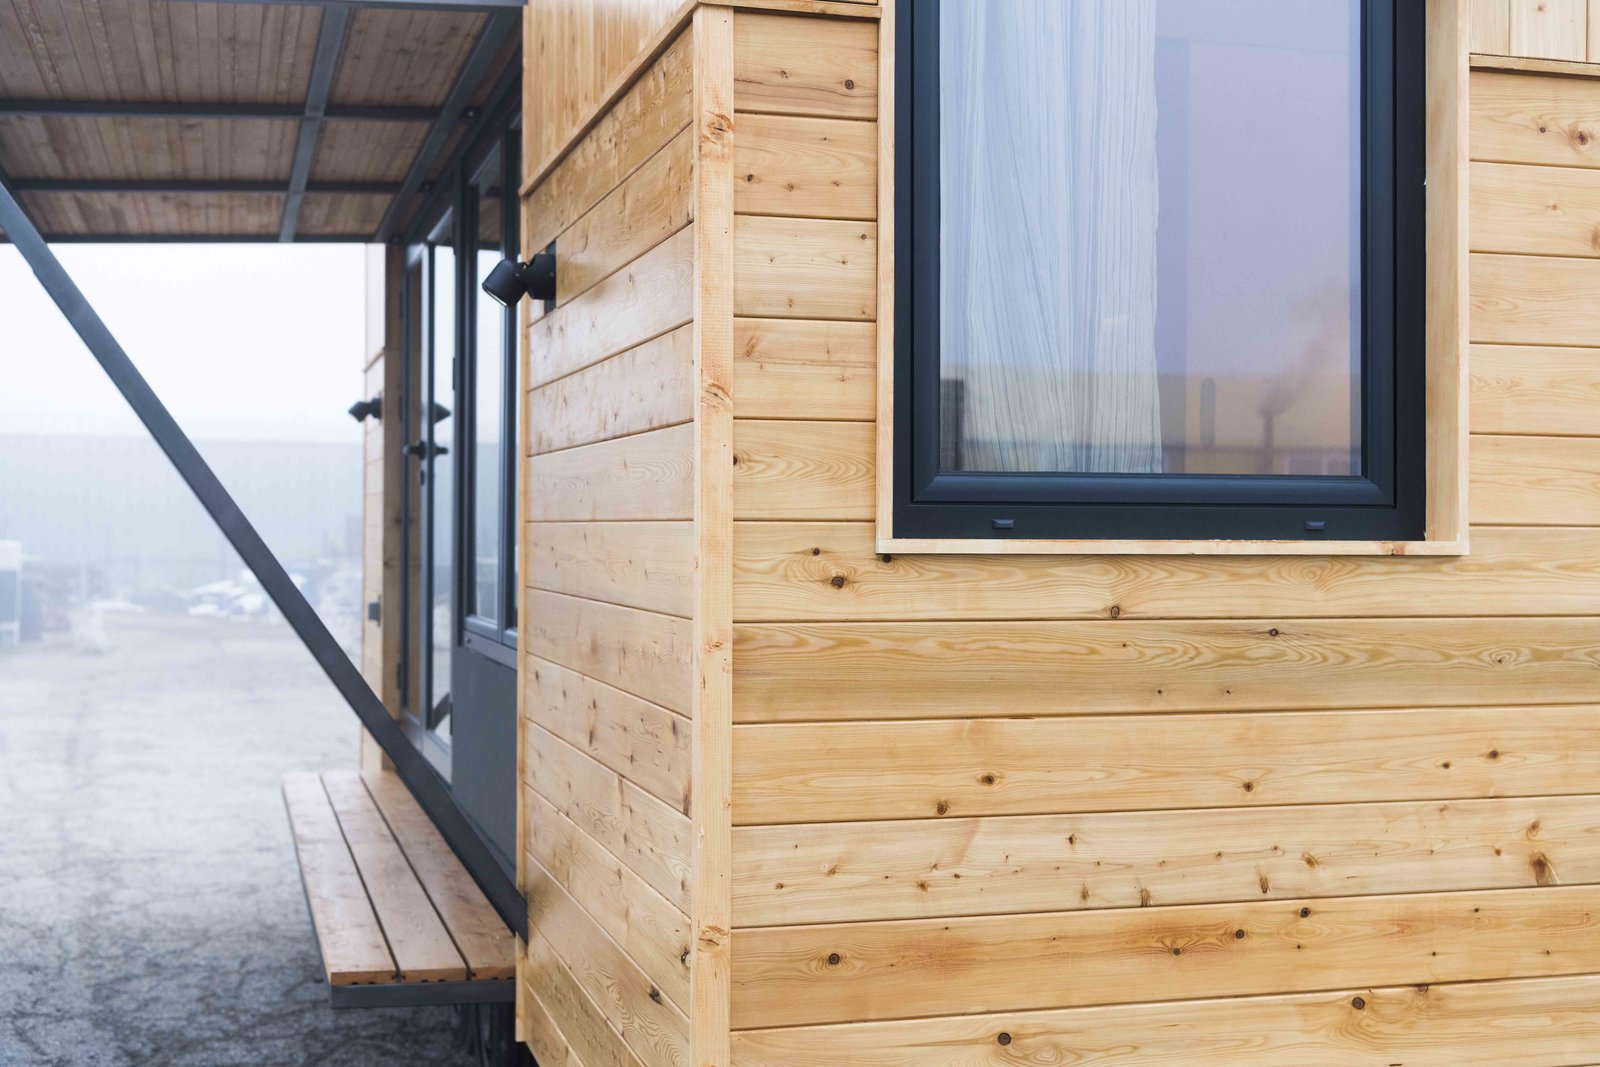 Exterior, Tiny Home Building Type, and Wood Siding Material Siberian larch cladding  KOLELIBA Family Tiny House